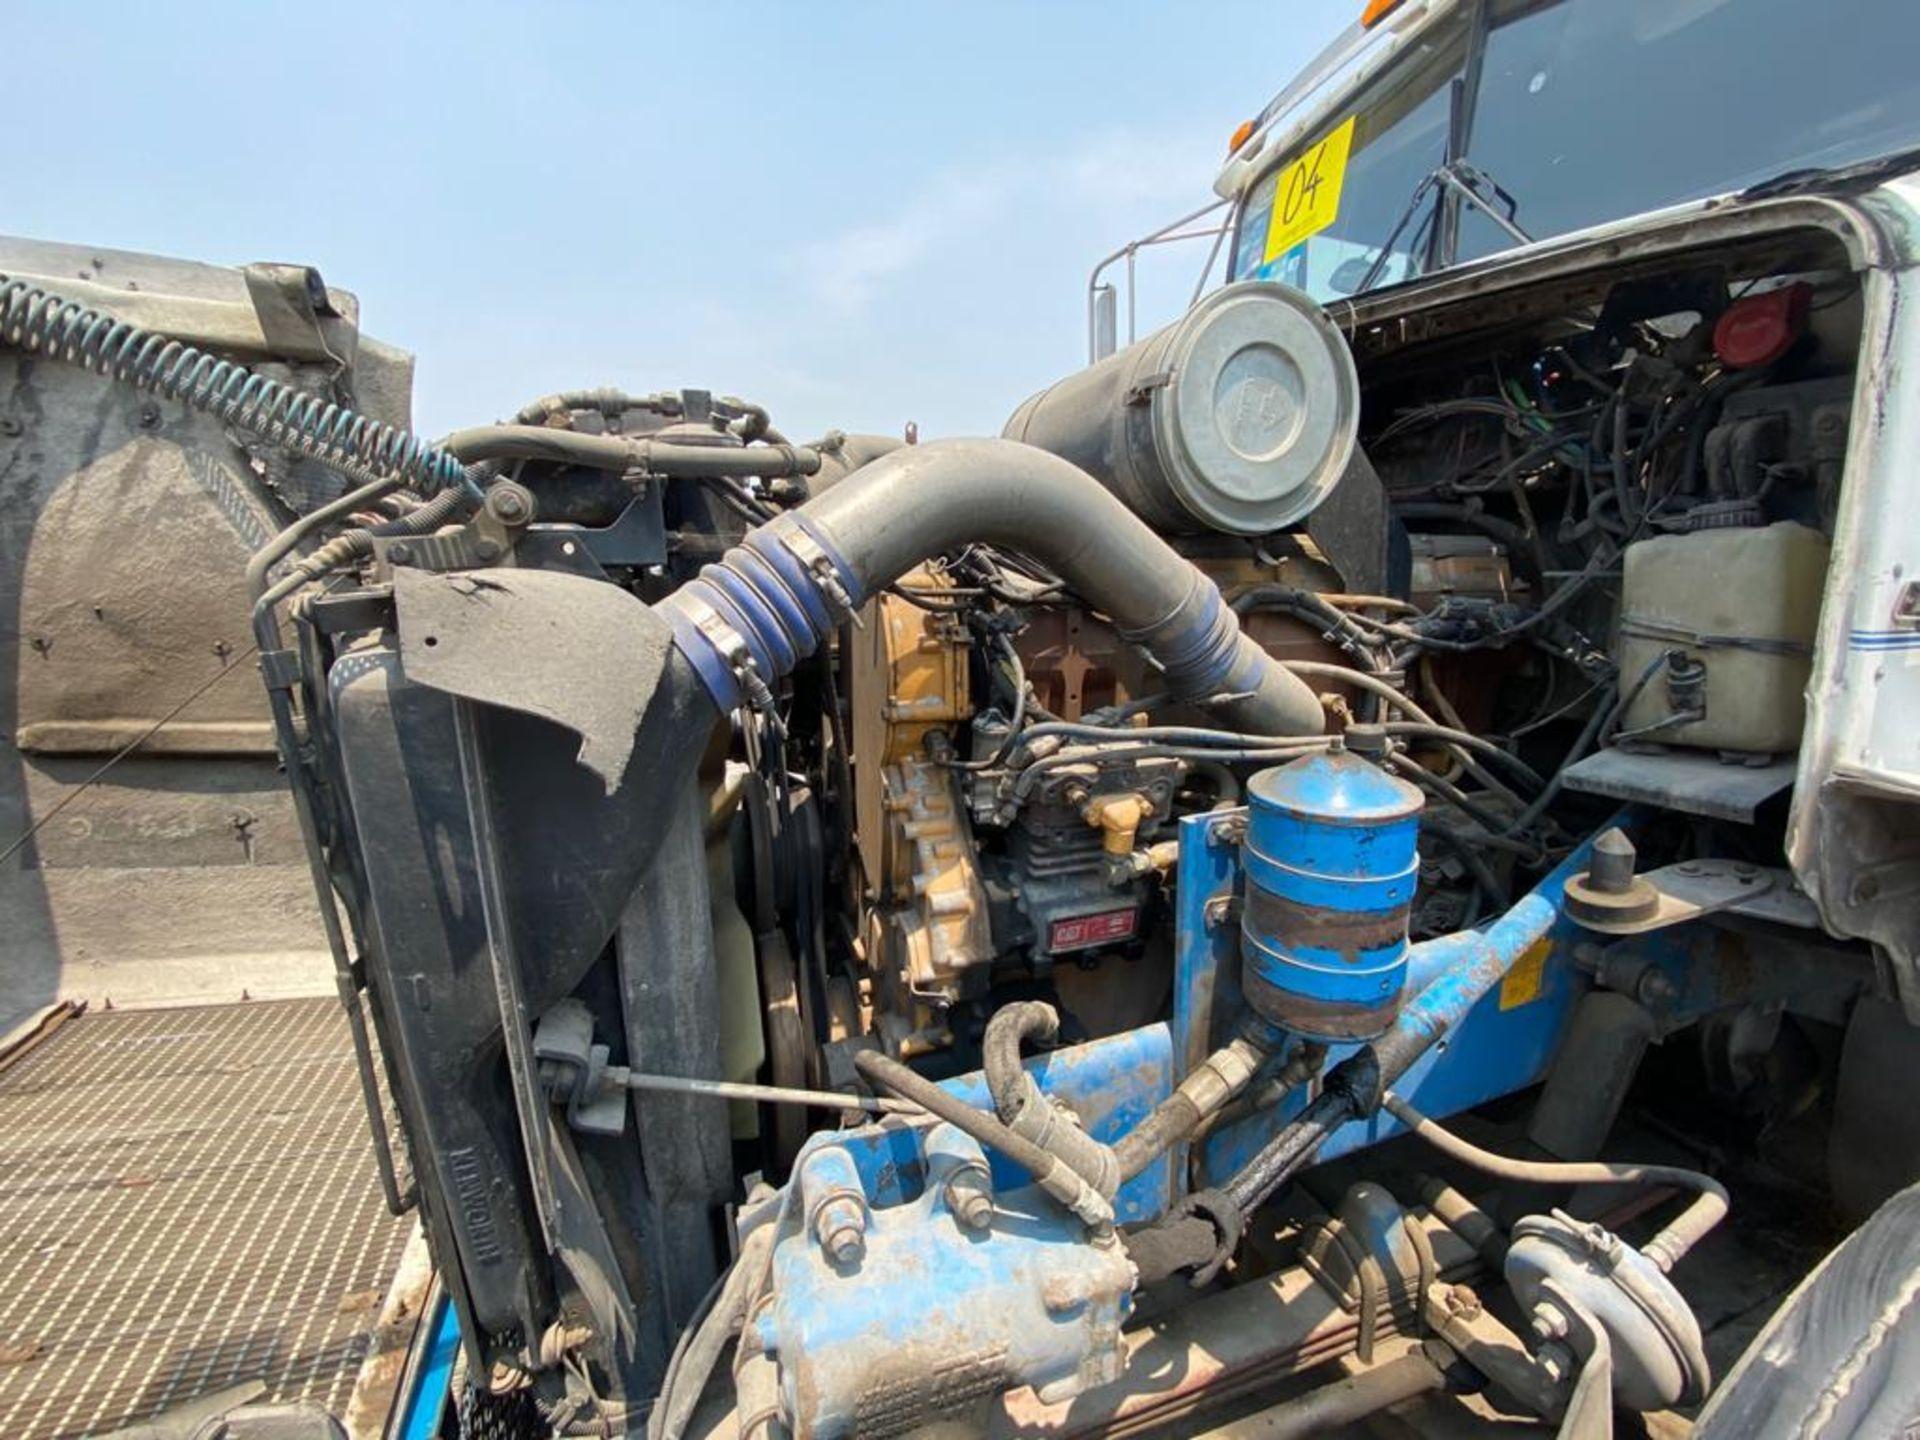 1999 Kenworth Sleeper truck tractor, standard transmission of 18 speeds - Image 68 of 70